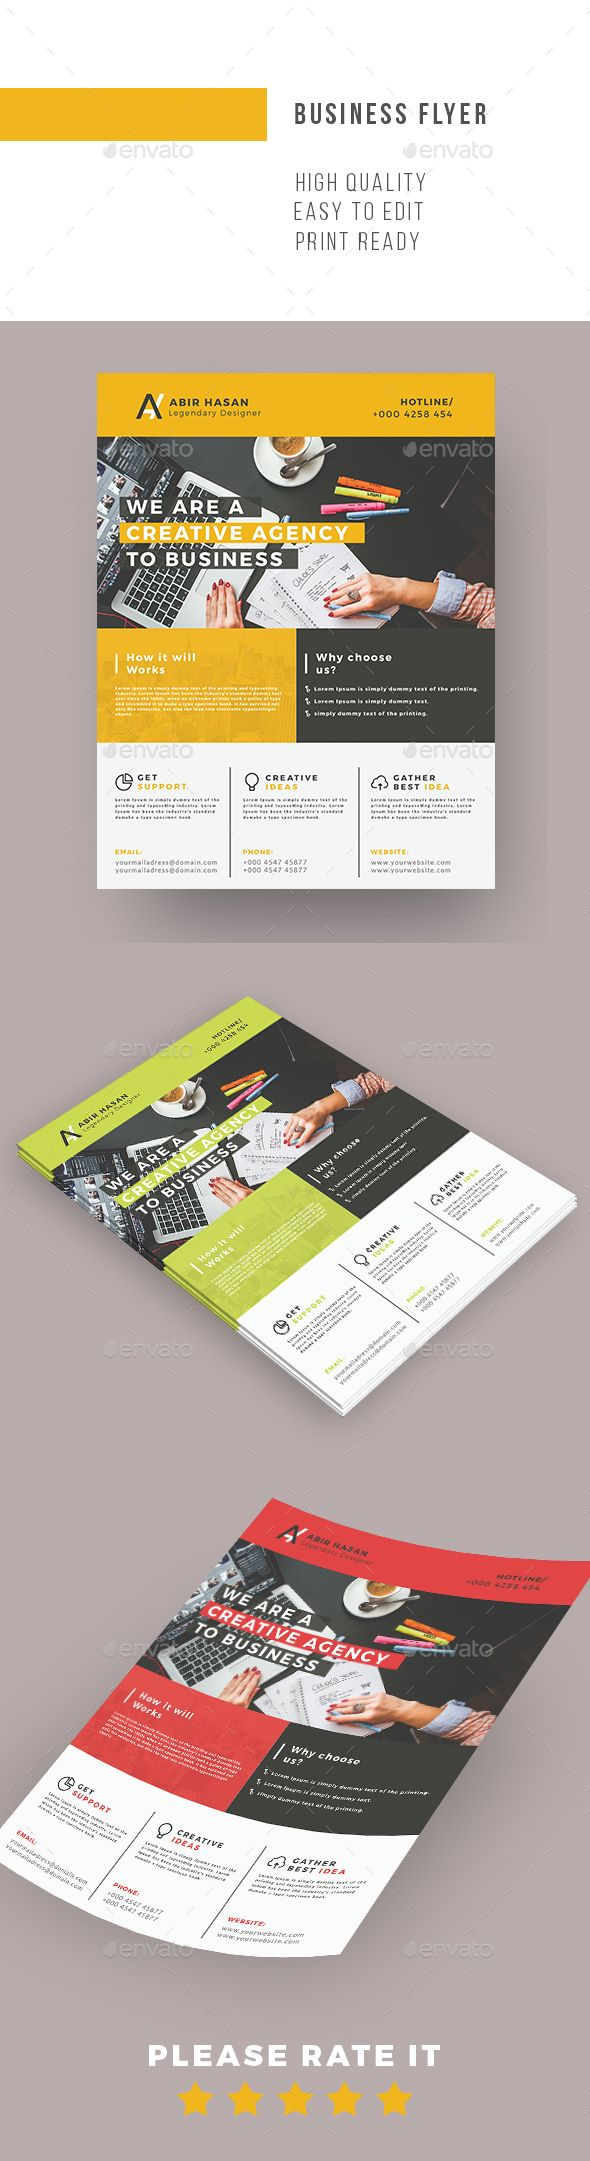 Elegant business flyer business flyers psd templates and template elegant business flyer wajeb Images